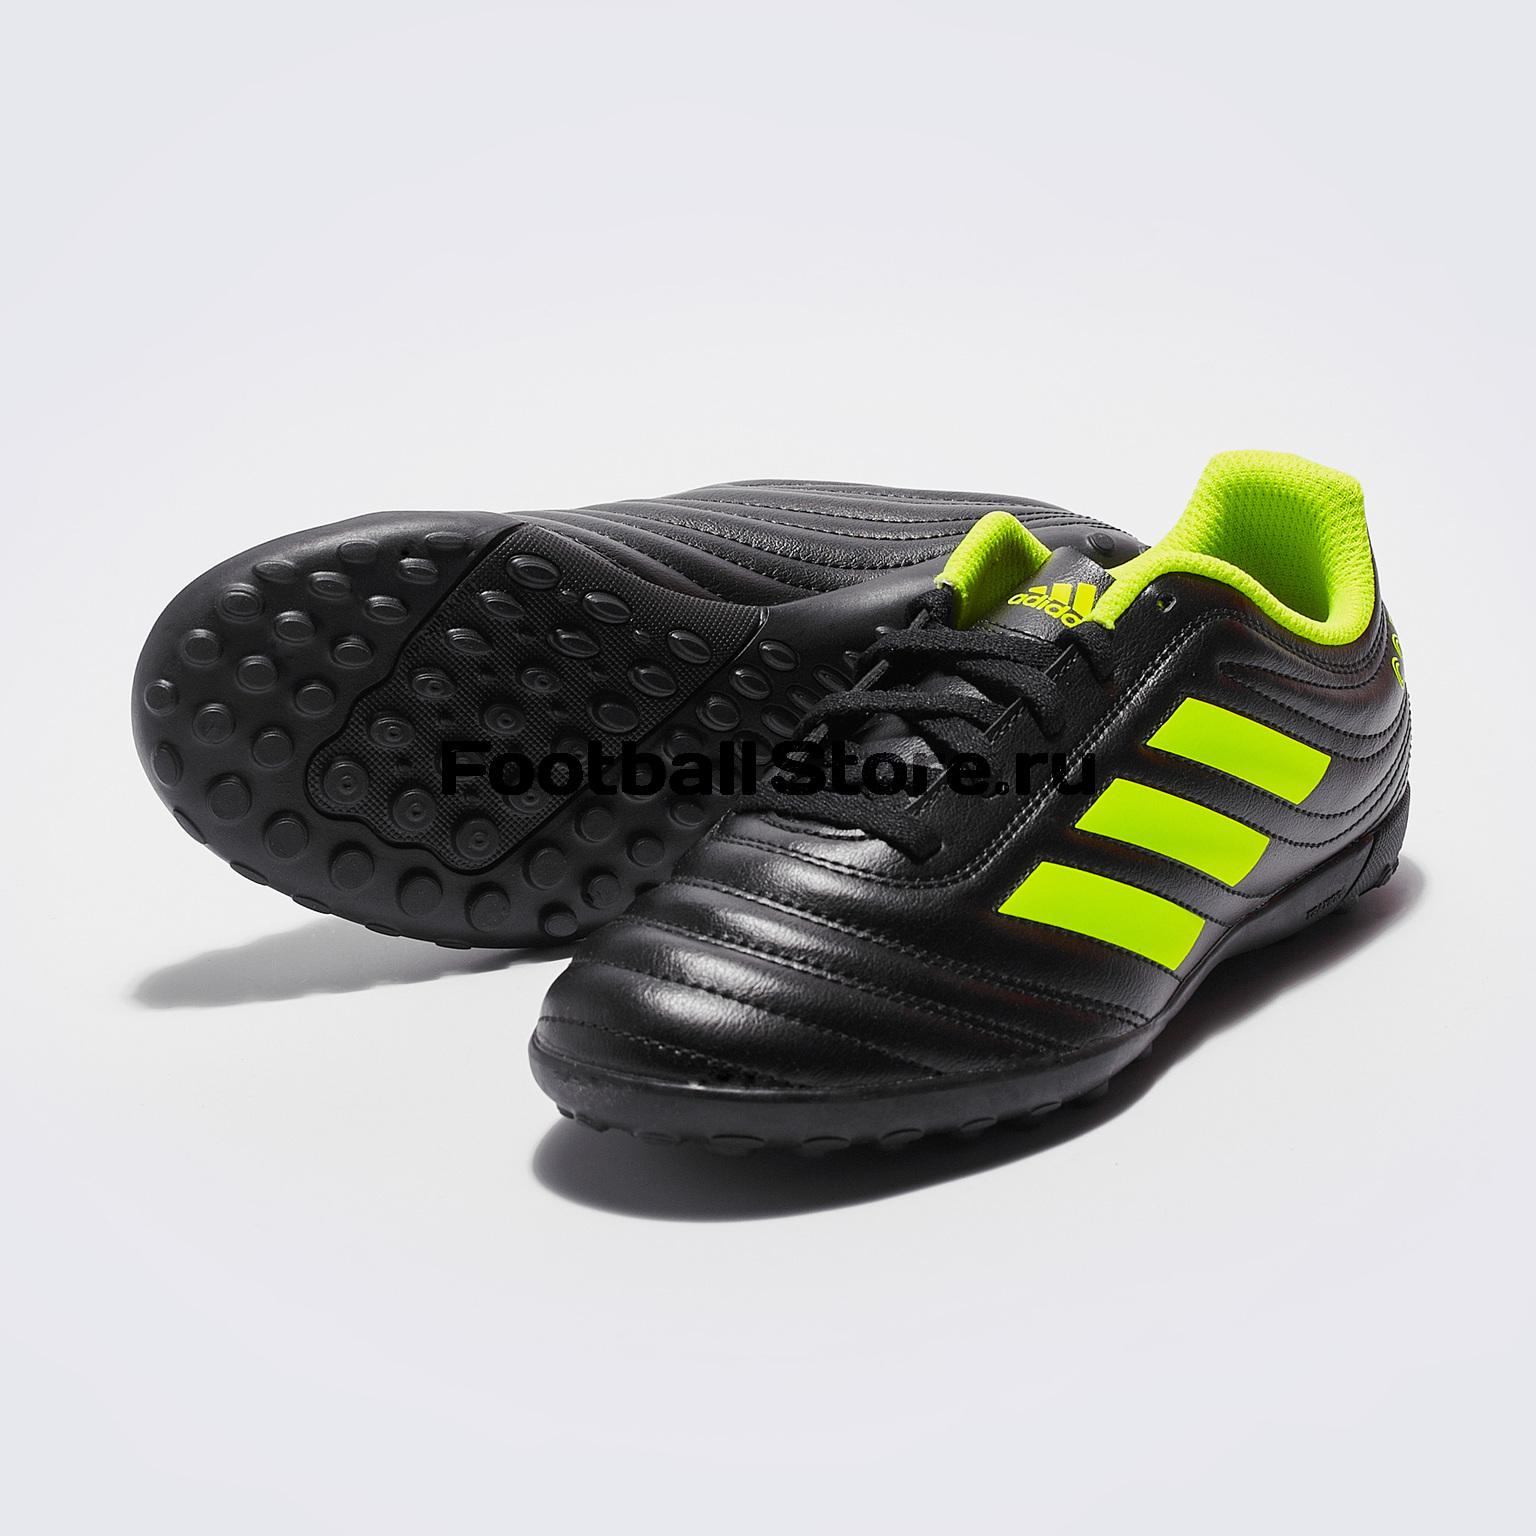 Шиповки детские Adidas Copa 19.4 TF D98100 adidas шиповки adidas ace 16 3 primemesh tf aq2564